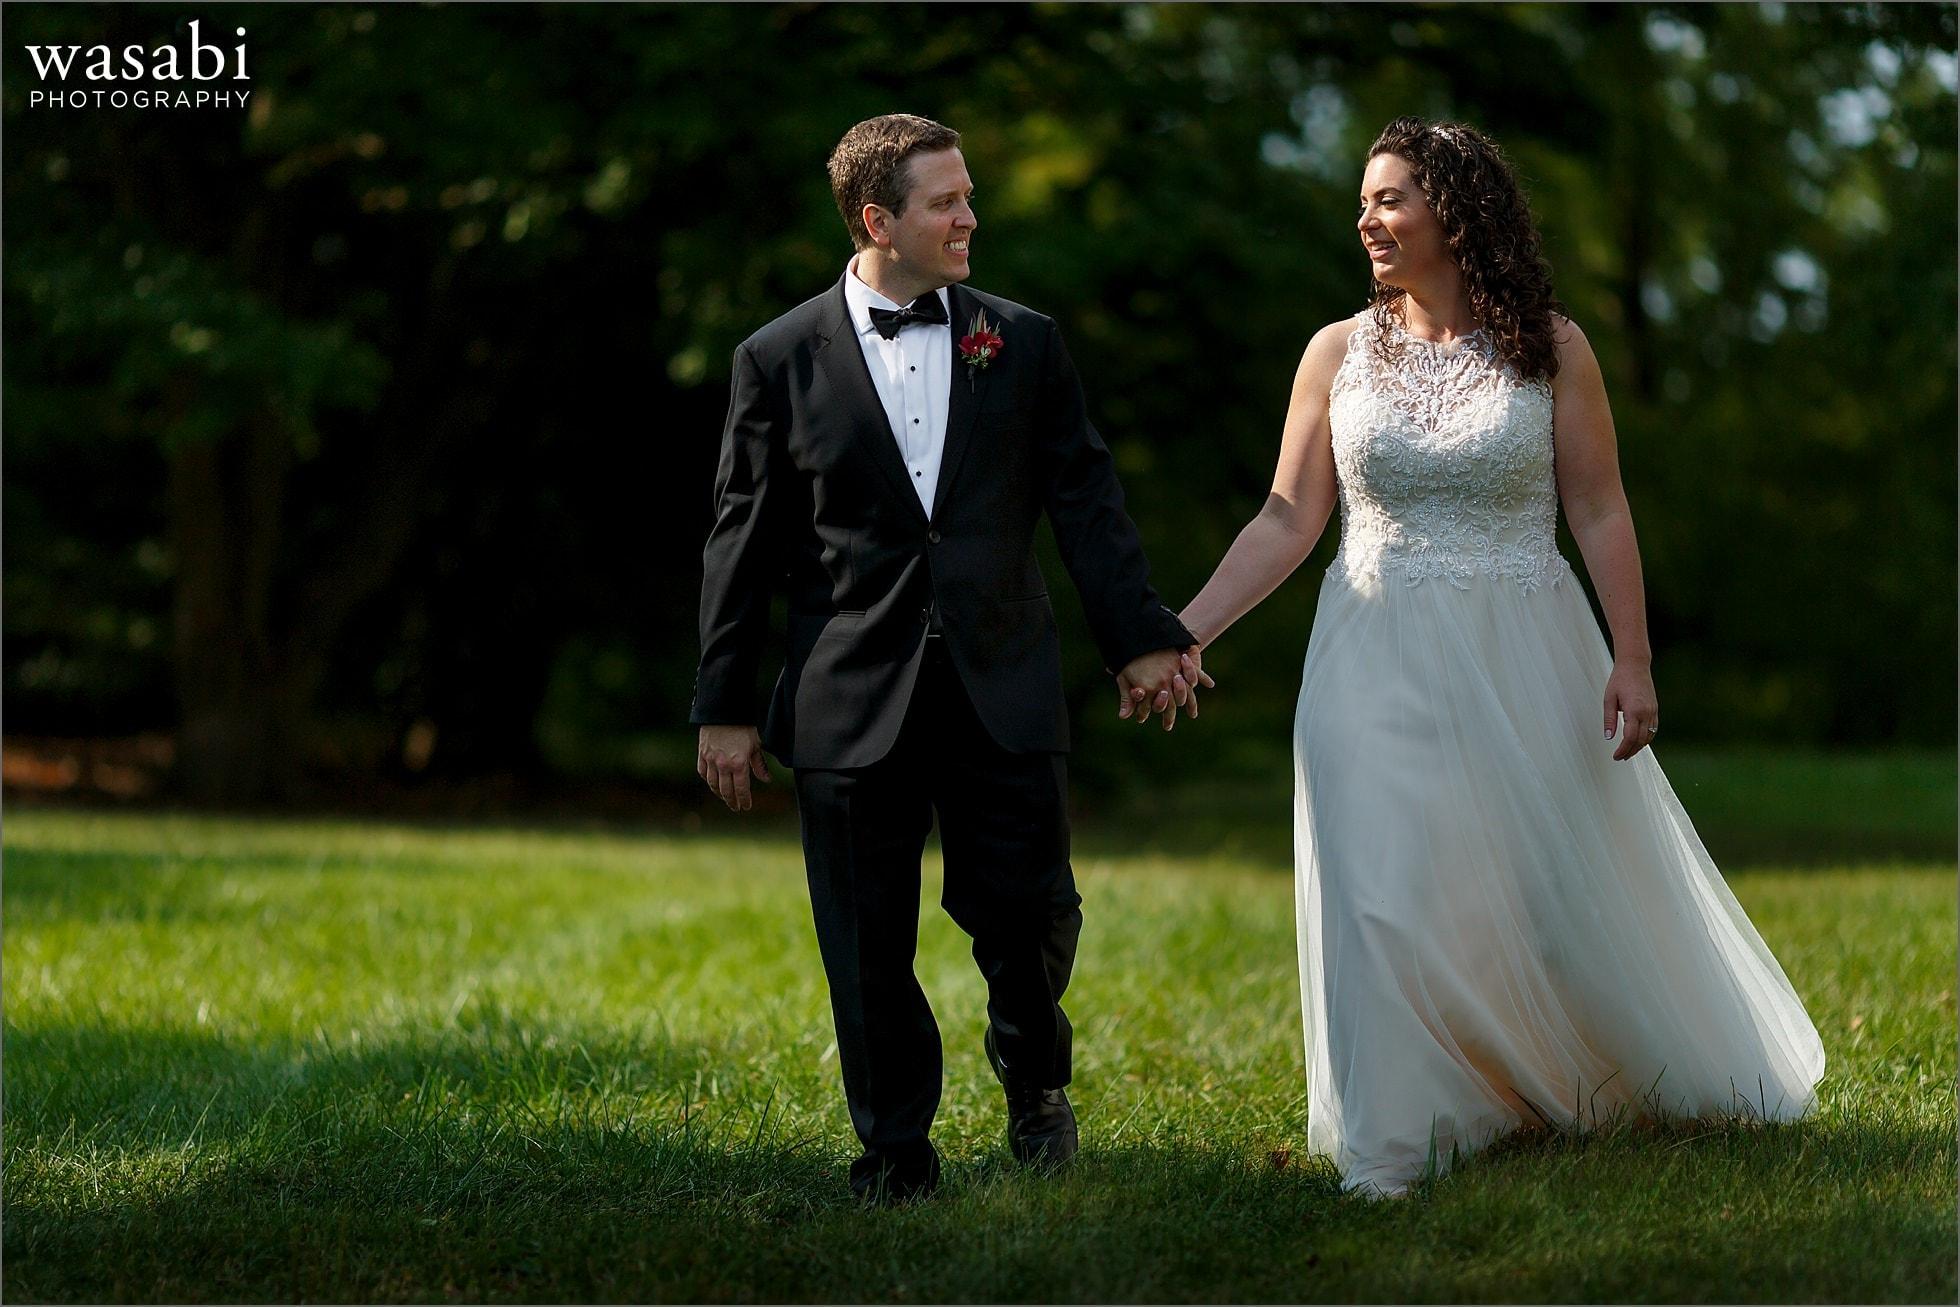 bride and groom walk during their morton arboretum wedding photos outdoors